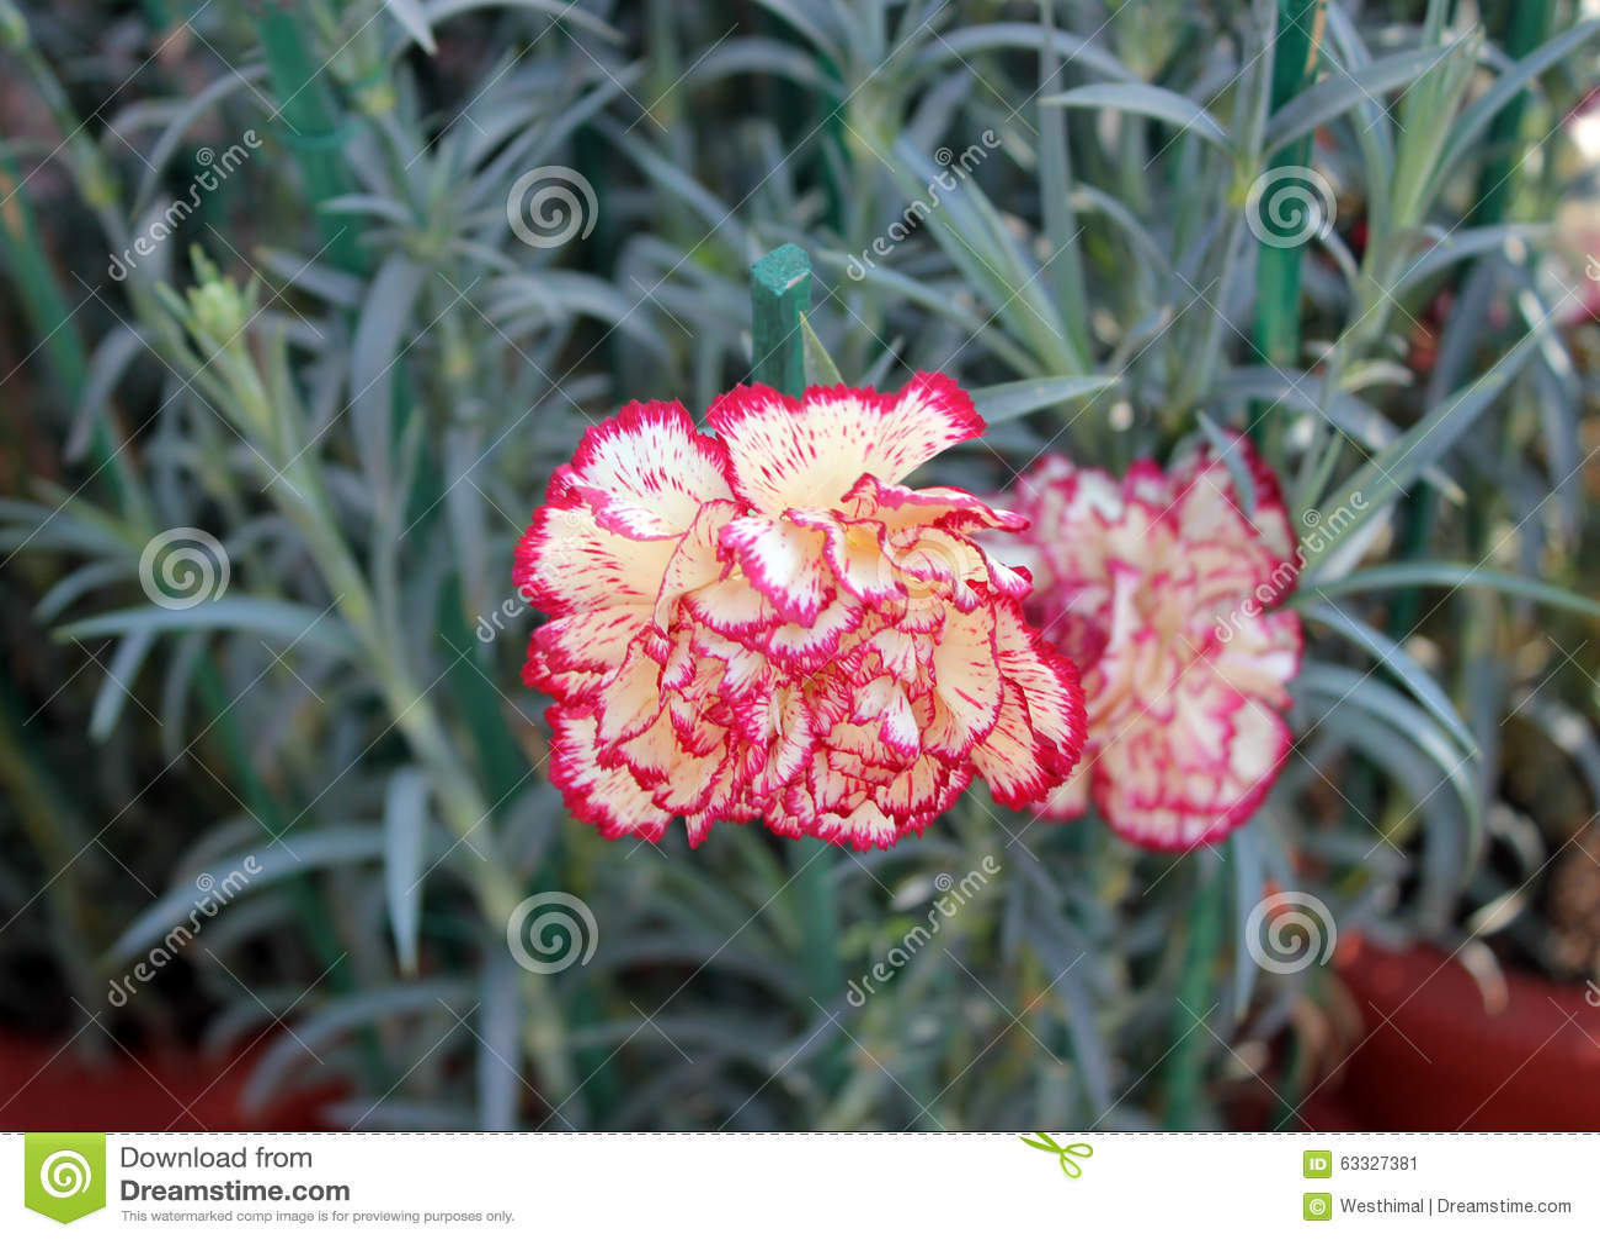 Dianthus caryophyllus Raspberry Ripple